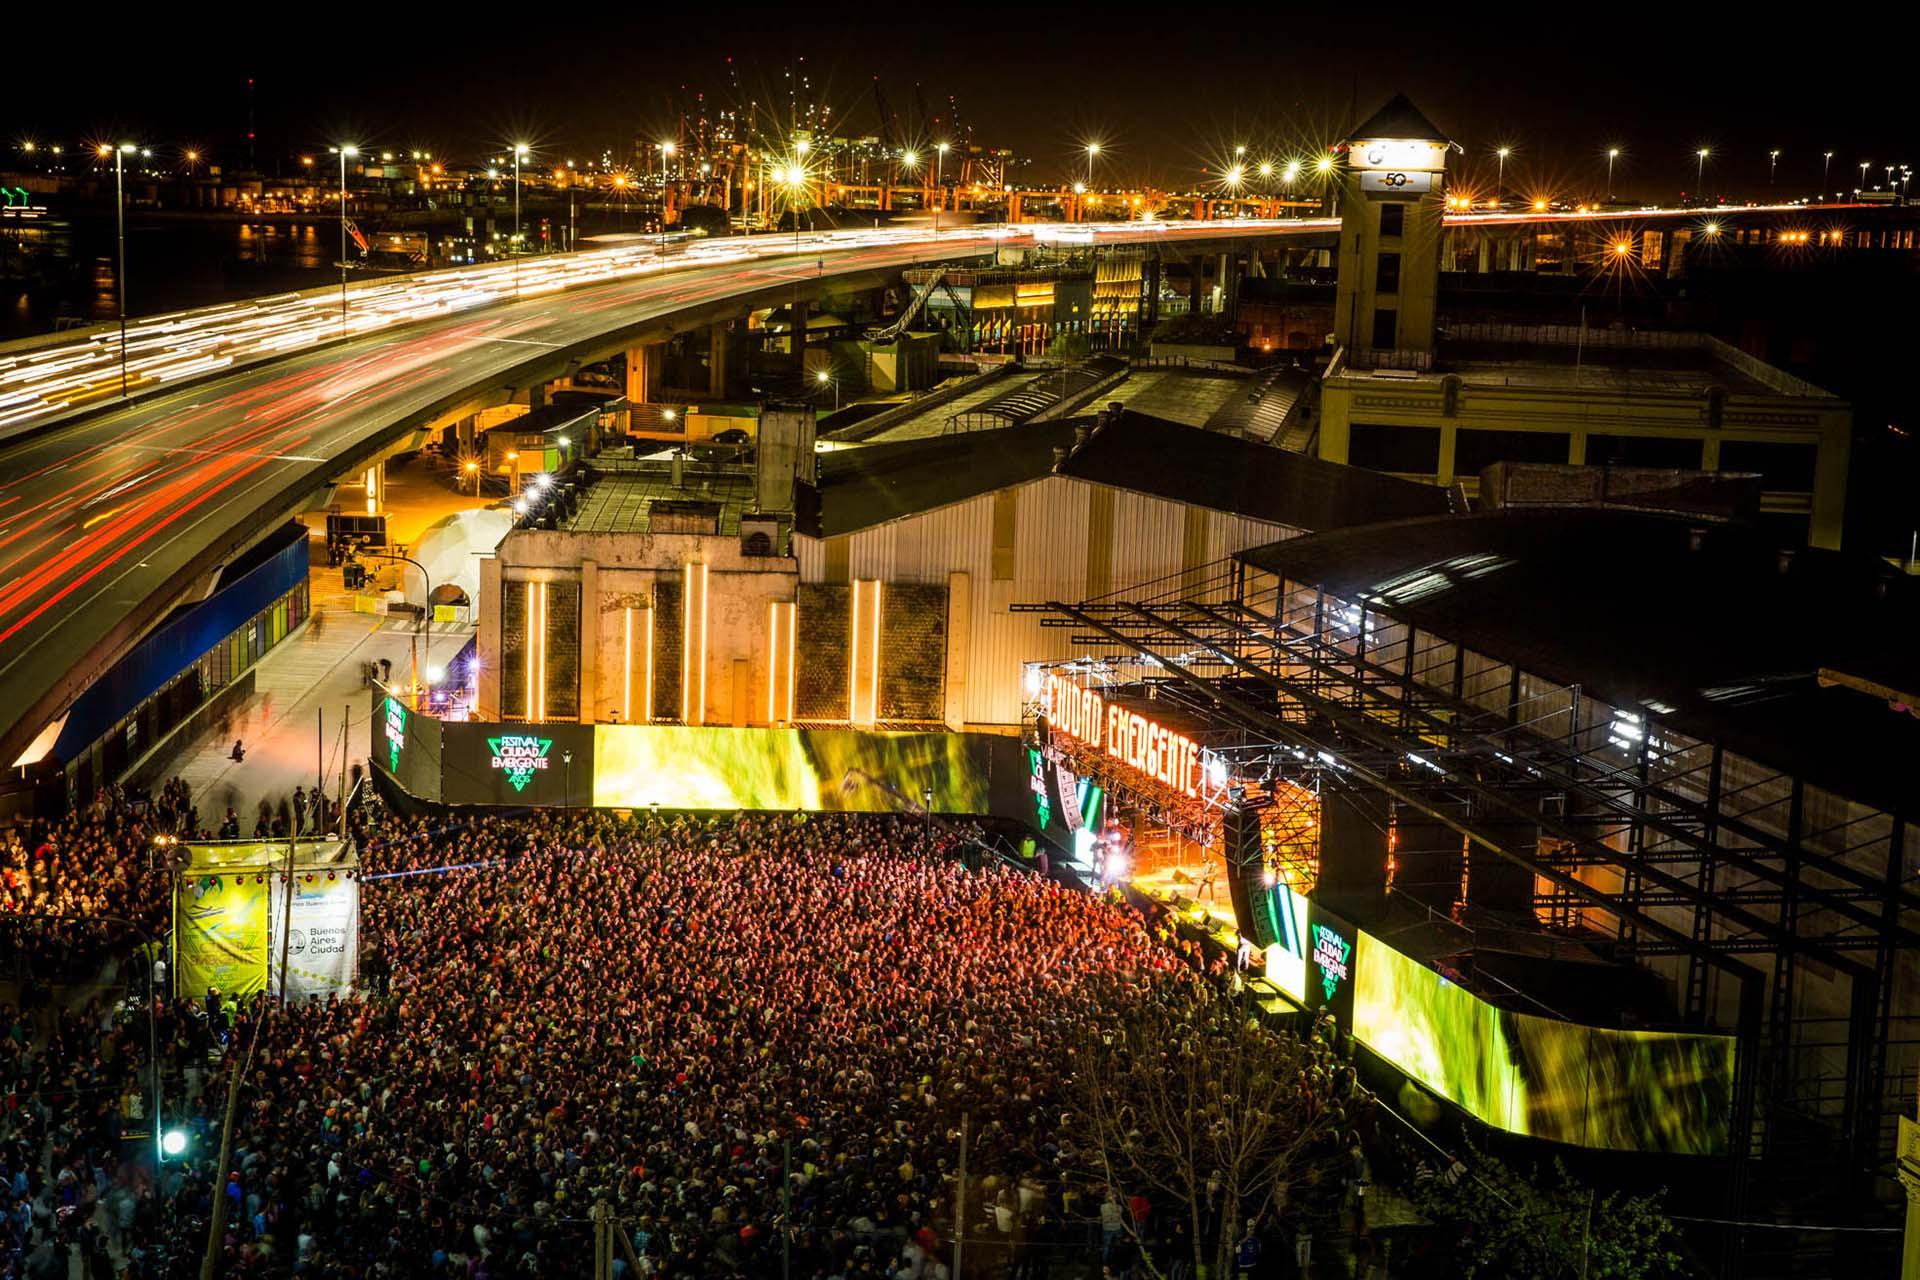 Cierre del Festival en la Plaza de la Usina